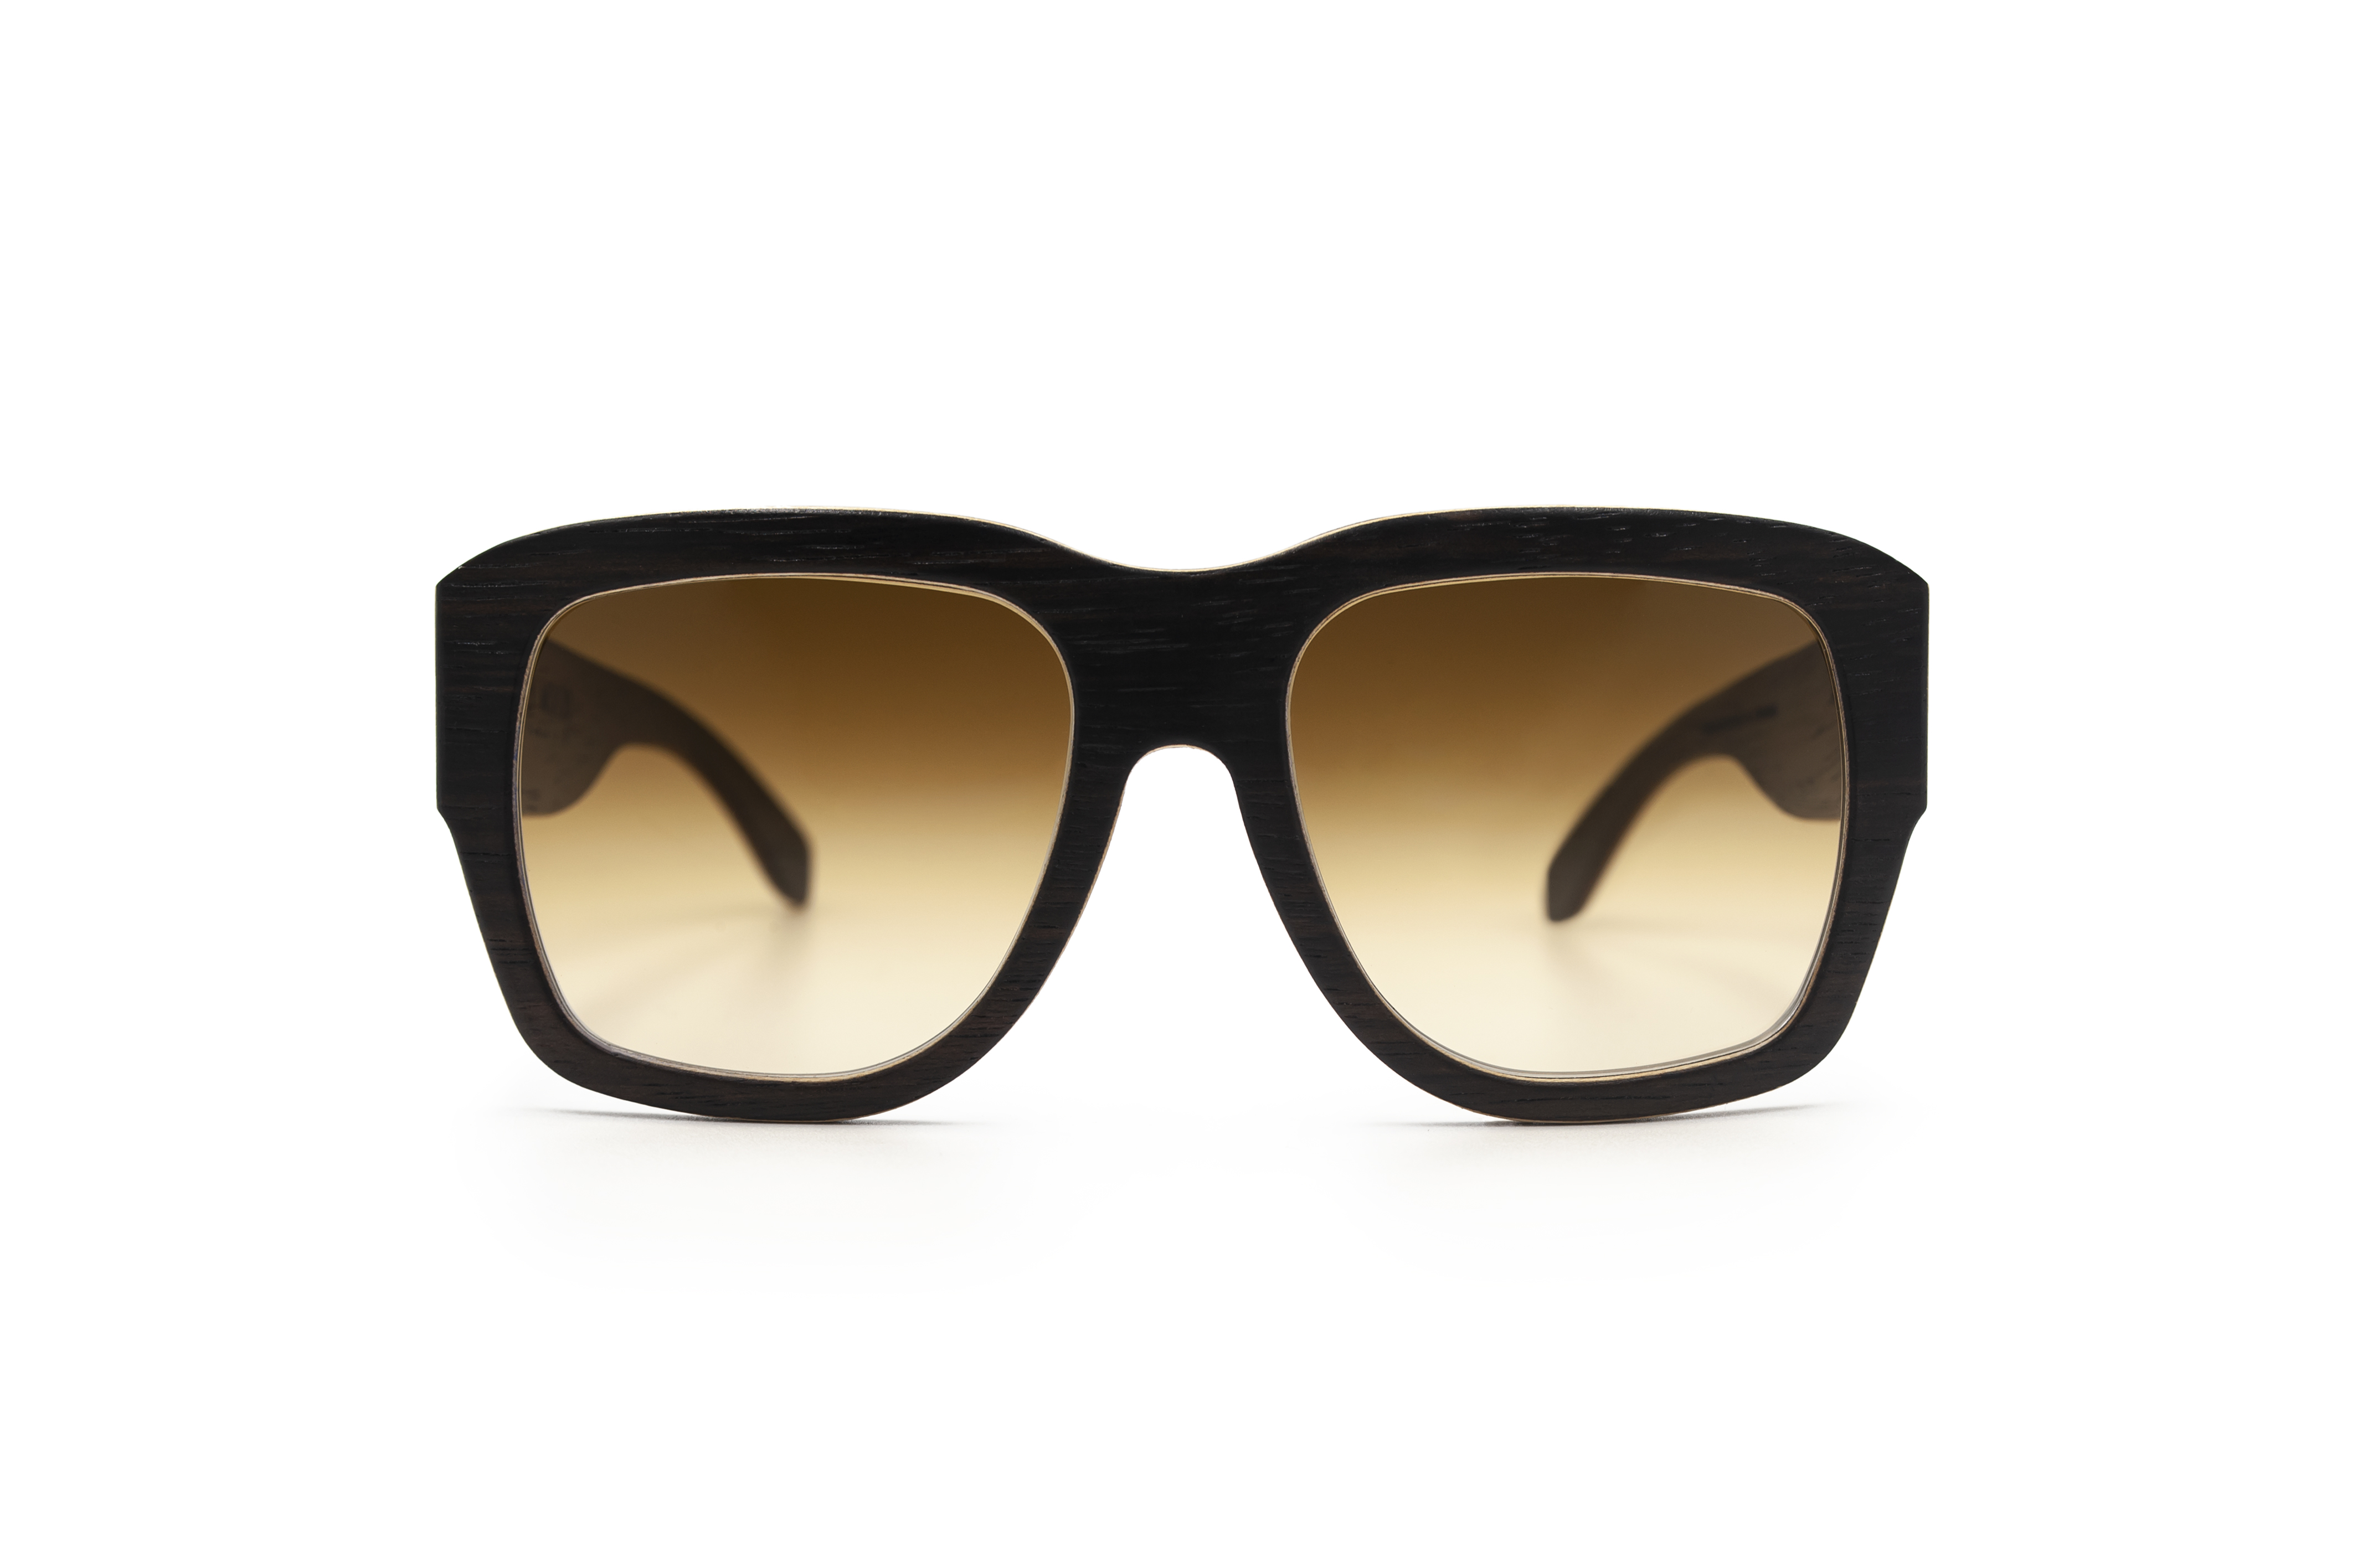 Angus big square sunglasses Ebony Wooden Sunglasses